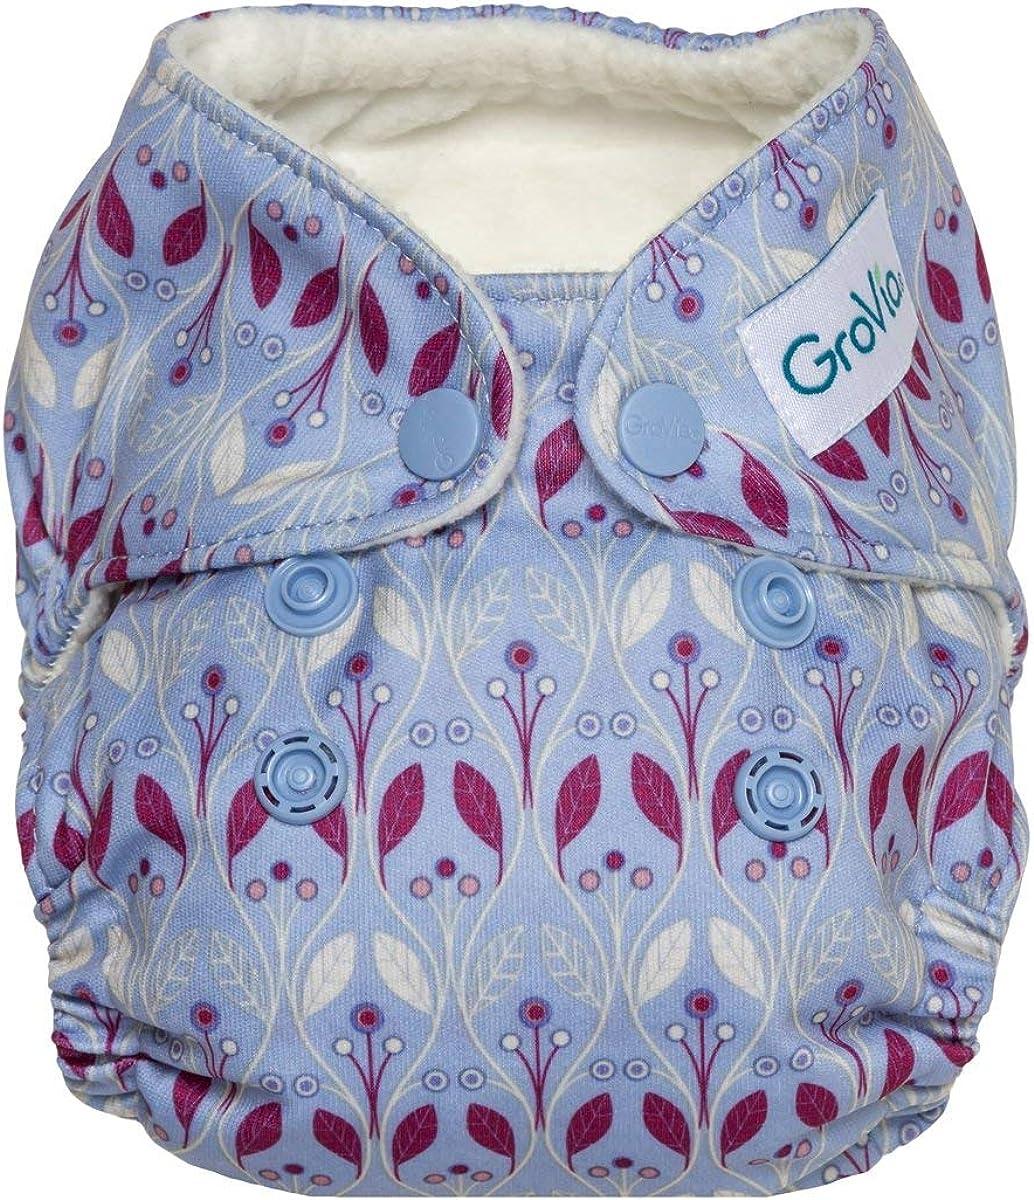 GroVia Newborn All in One Snap Reusable Cloth Diaper (AIO)